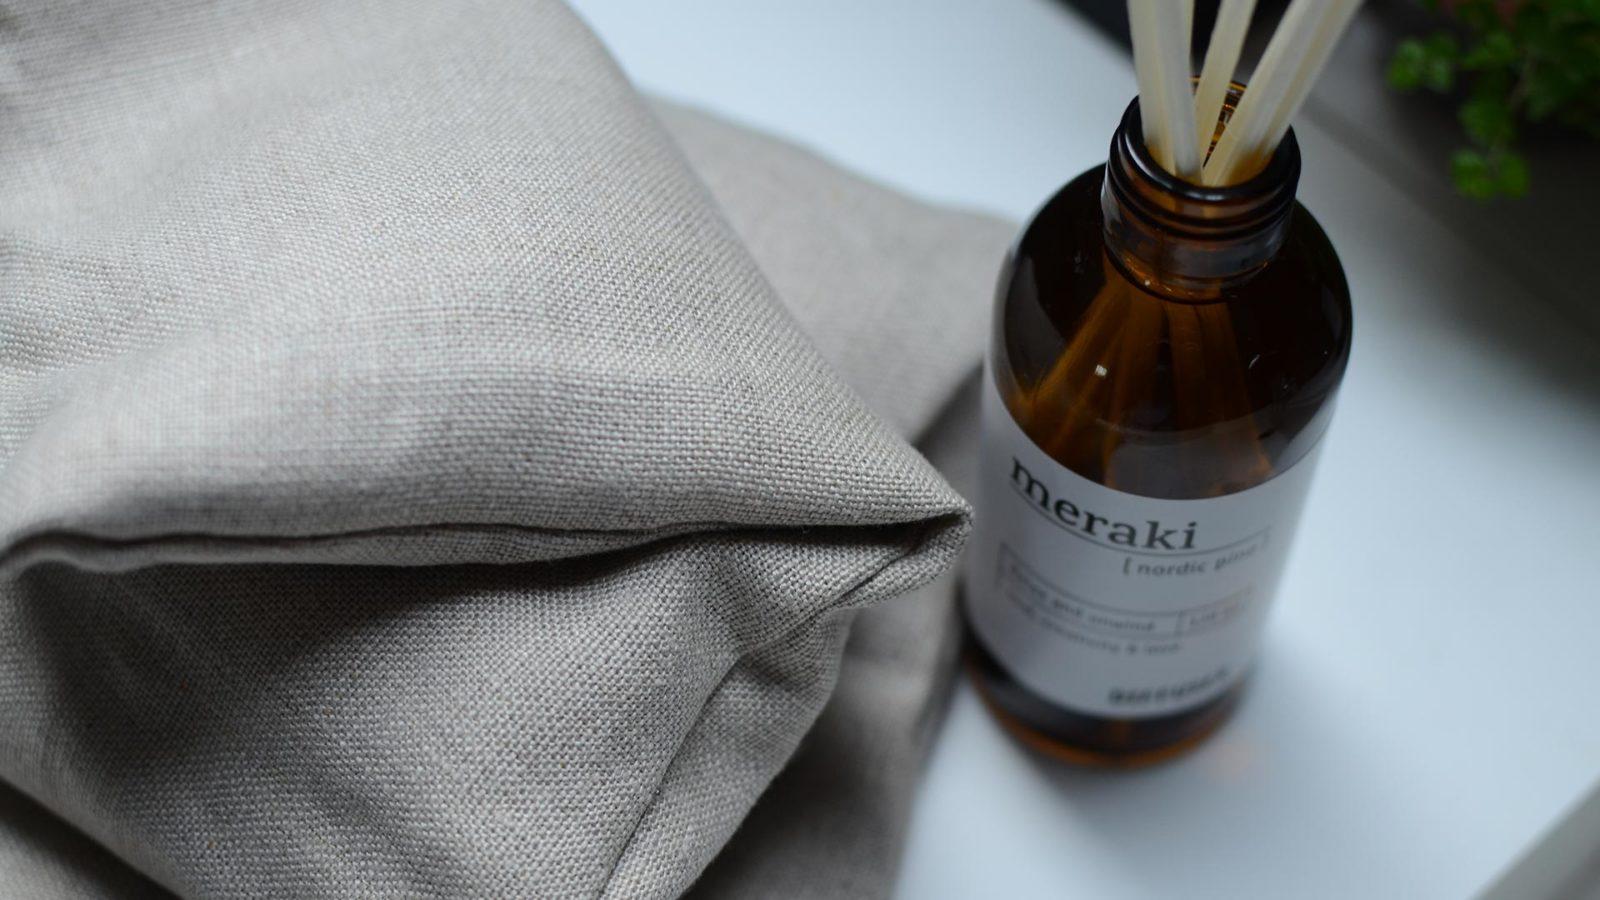 meraki soothing neck wrap in organic linen